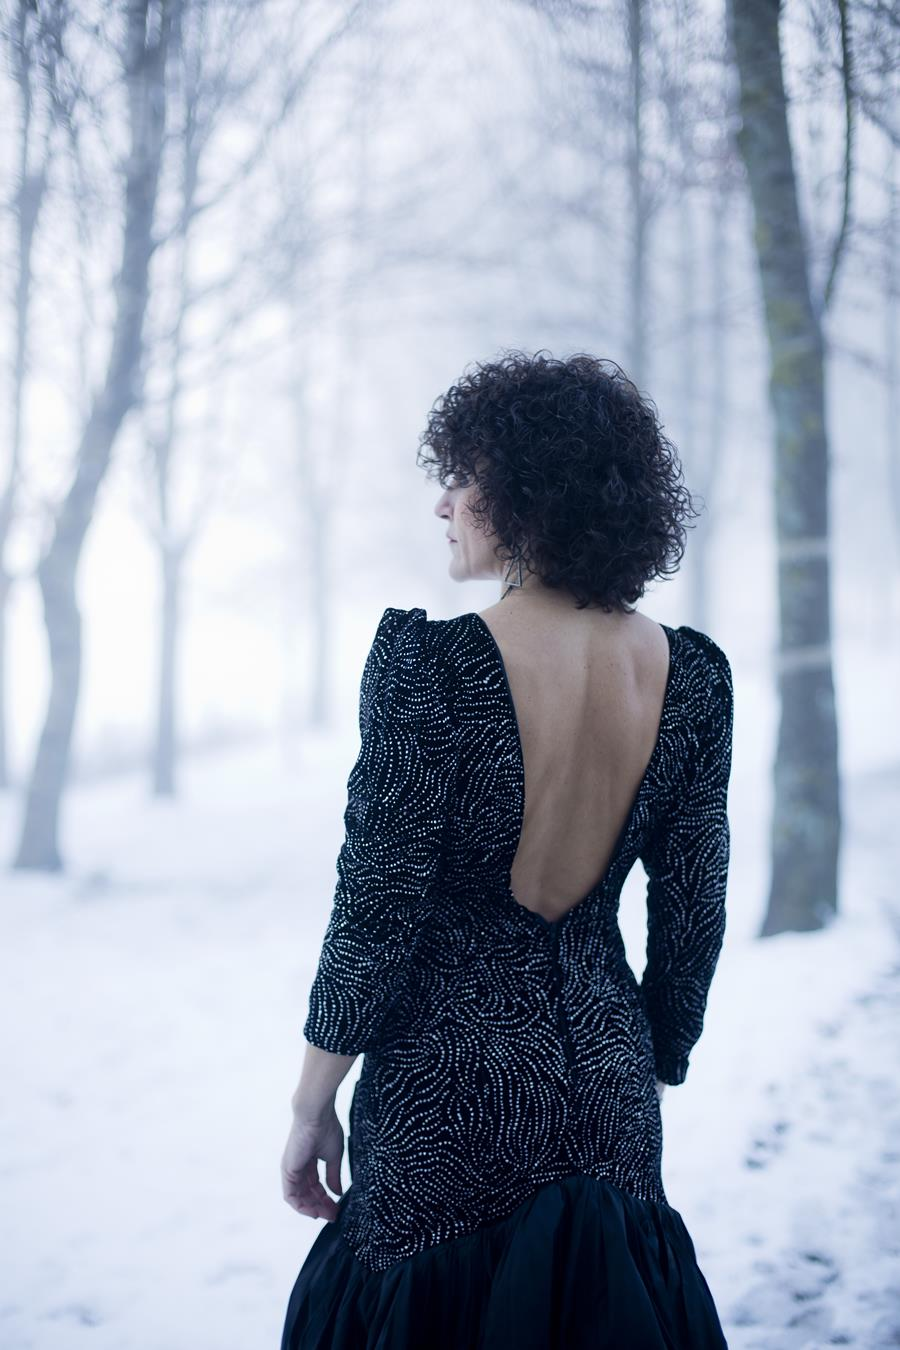 Rebeca Valdivia, personal shopper, estilista, stilist, asesora de imagen, vintage, look fiesta, brilli brilli, lentejuelas, pailletes, look navideño, look fin de año, noche vieja, paillete shirt, velvet blazer, velvet dress, snow, nieve, Tull